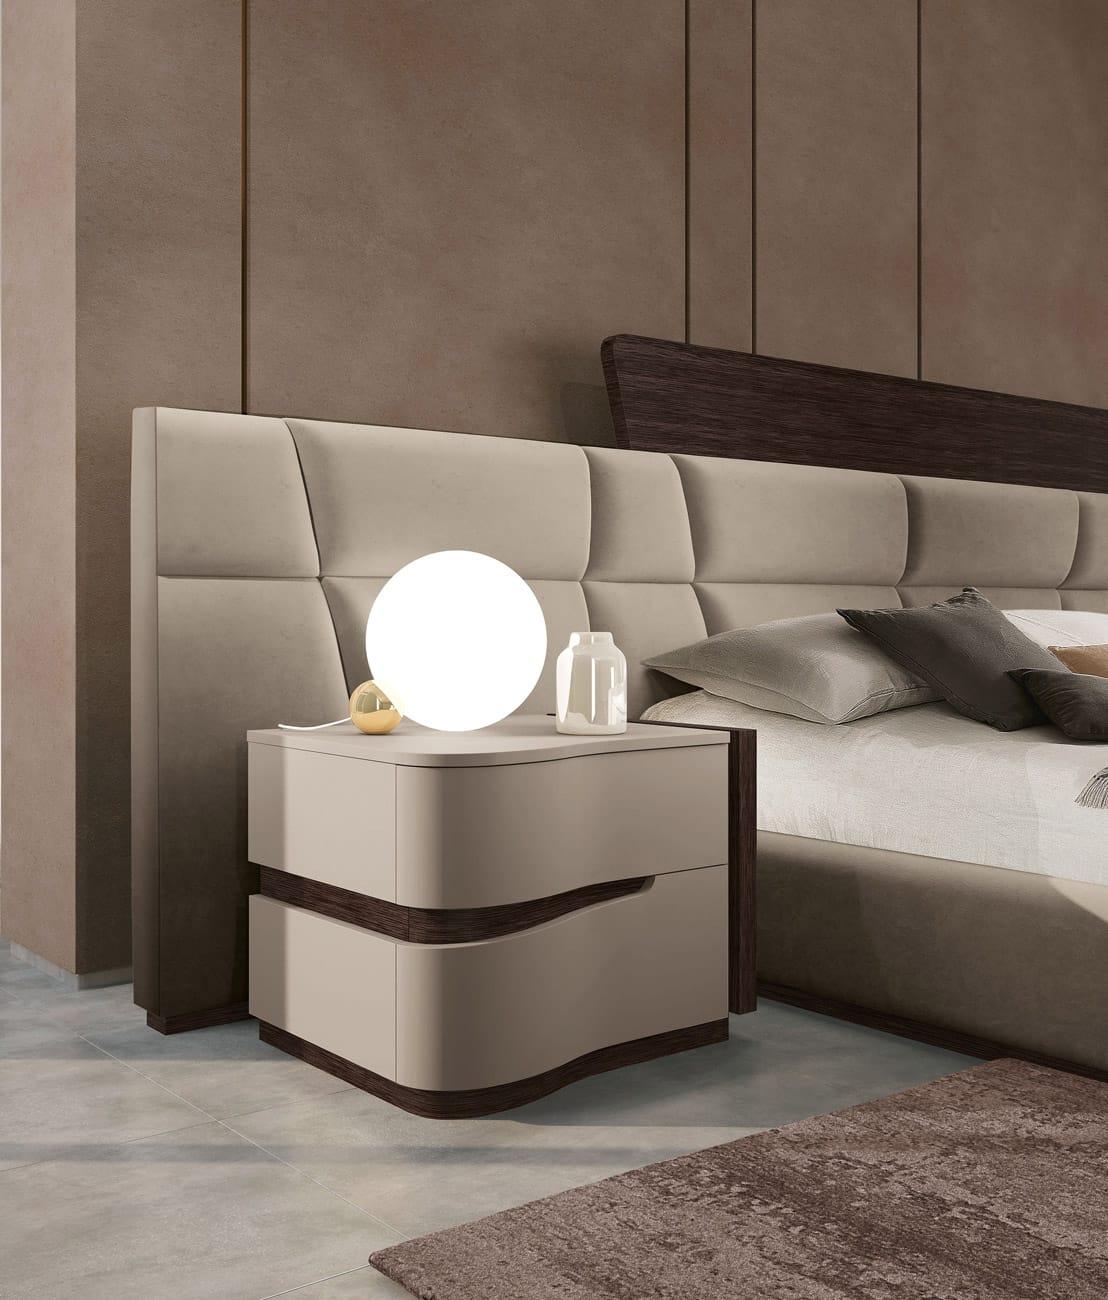 adriatica-like-comodini-like-letto-system.jpg